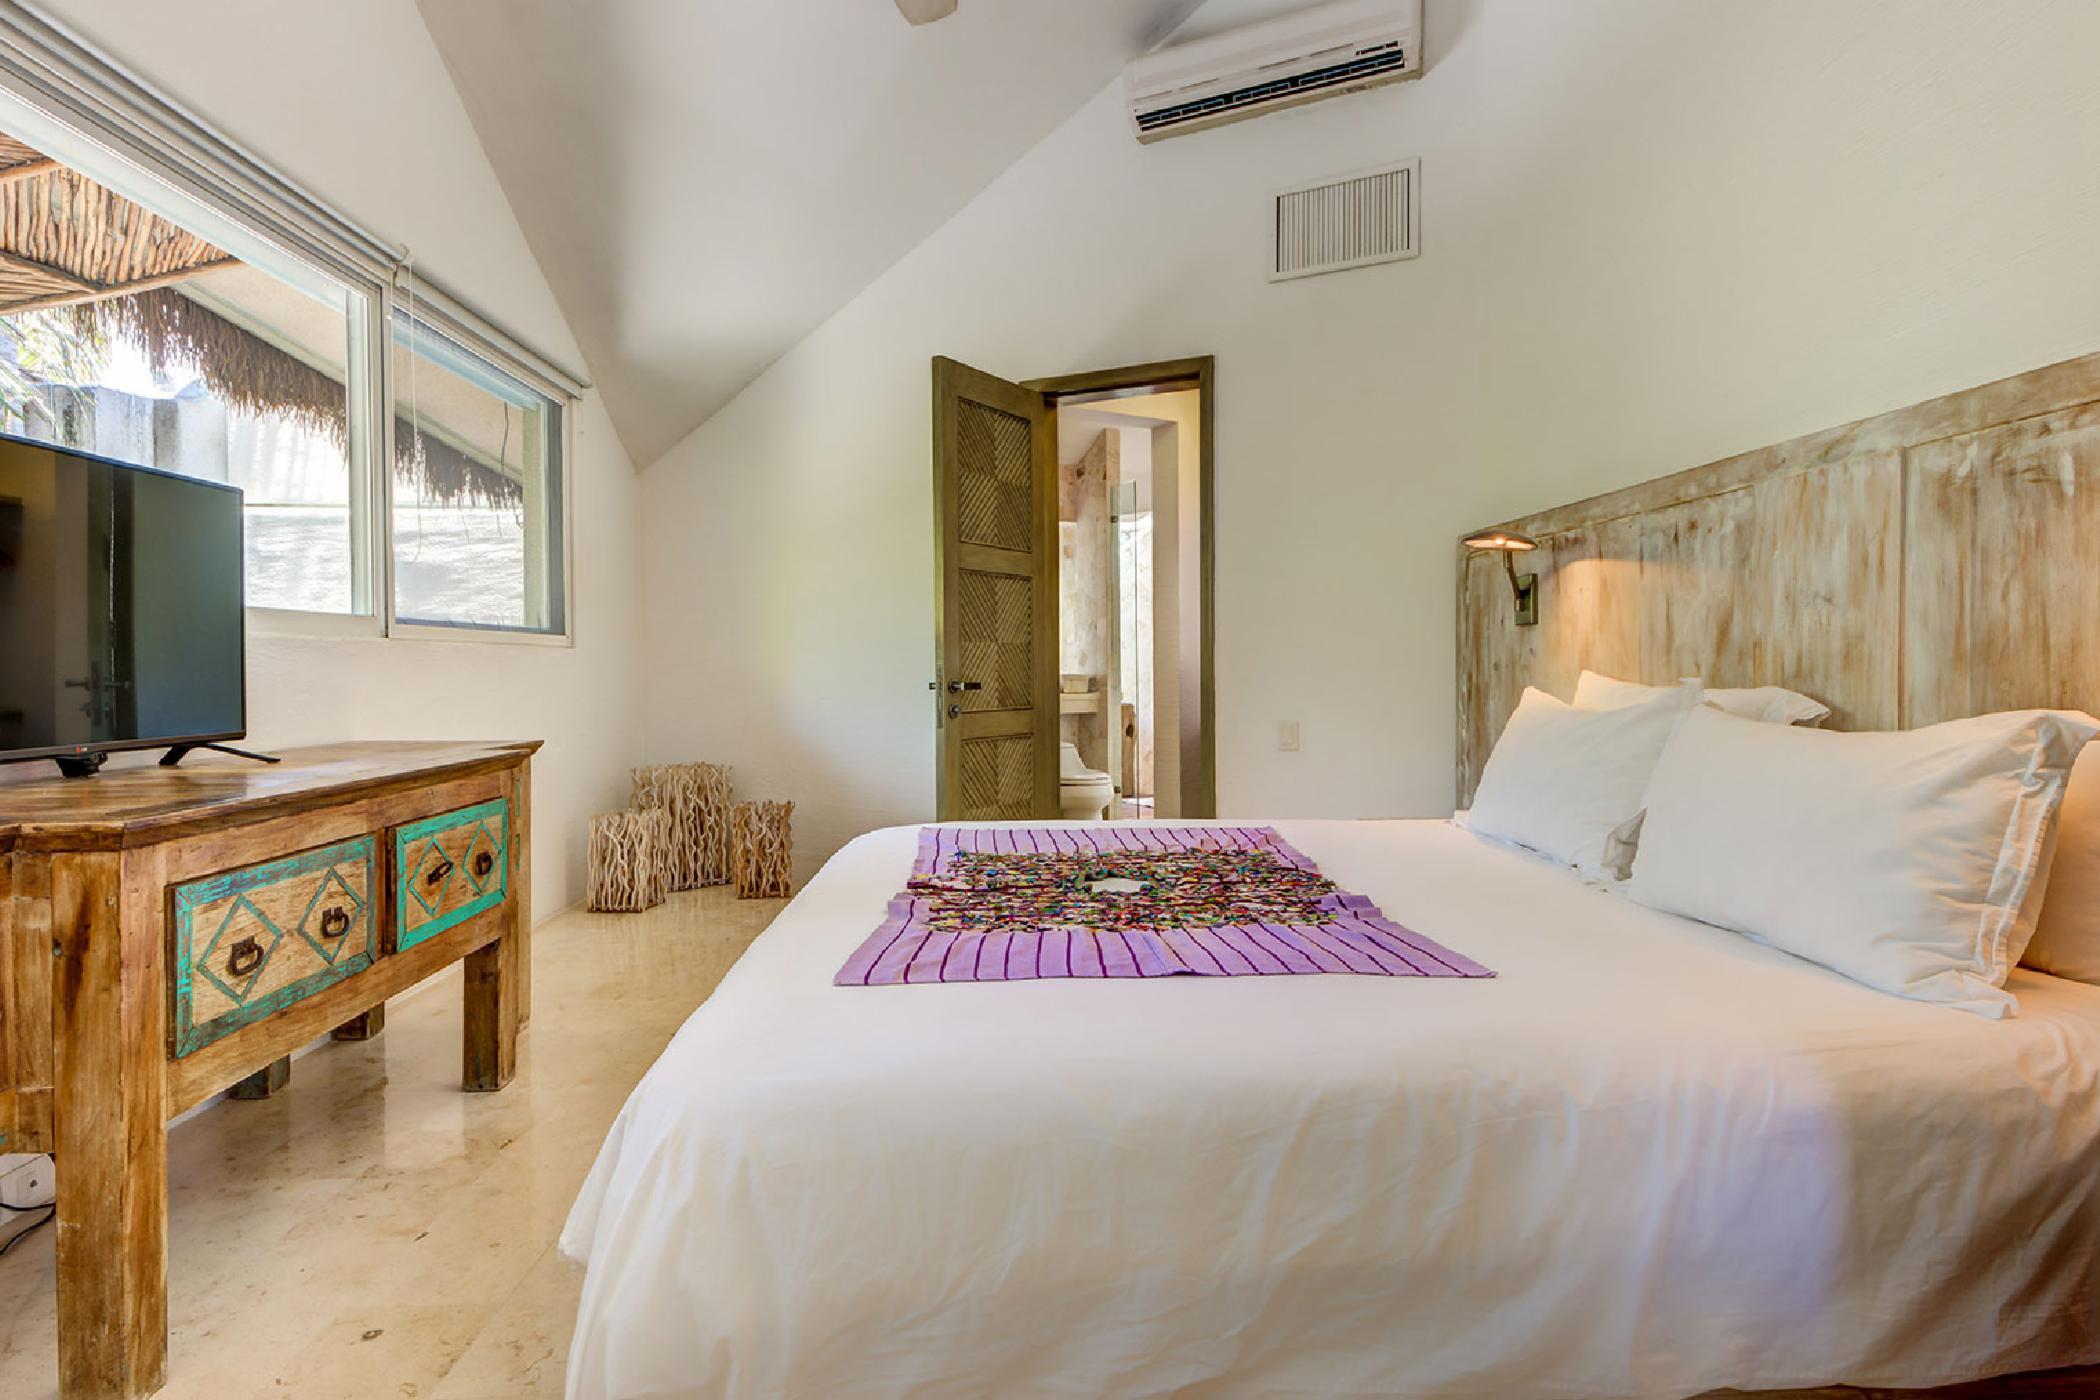 Maya_Luxe_Riviera_Maya_Luxury_Villas_Experiences_Puerto_Aventuras_5_Bedrooms_Zacil_Na_26.jpg